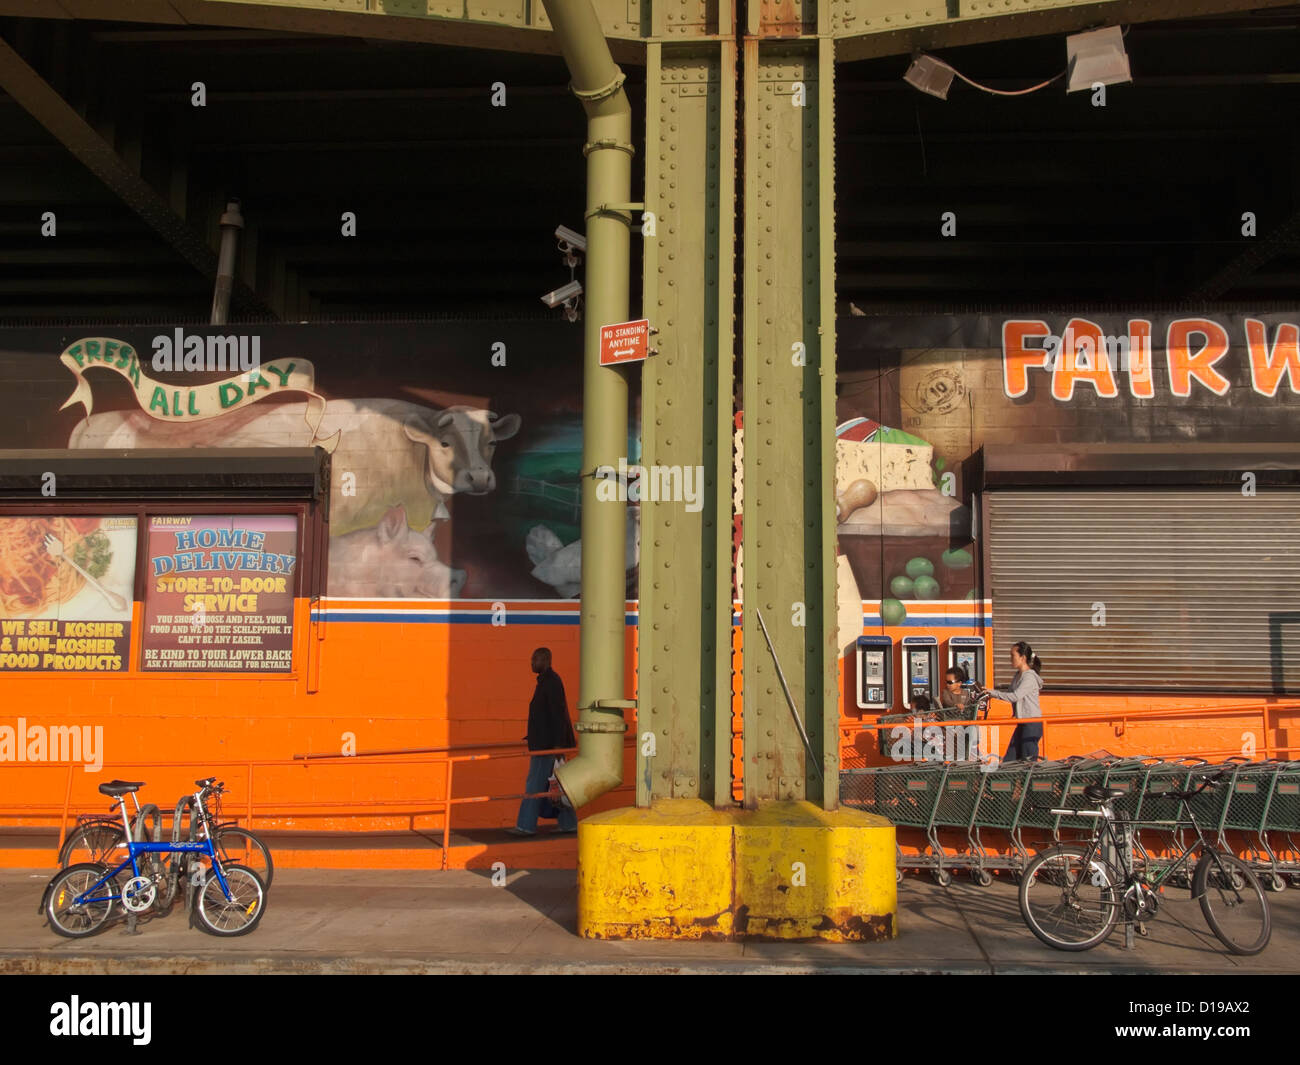 Fairway Supermarket, tucked under the West Side Highway (Henry Hudson Parkway) in Harlem. - Stock Image